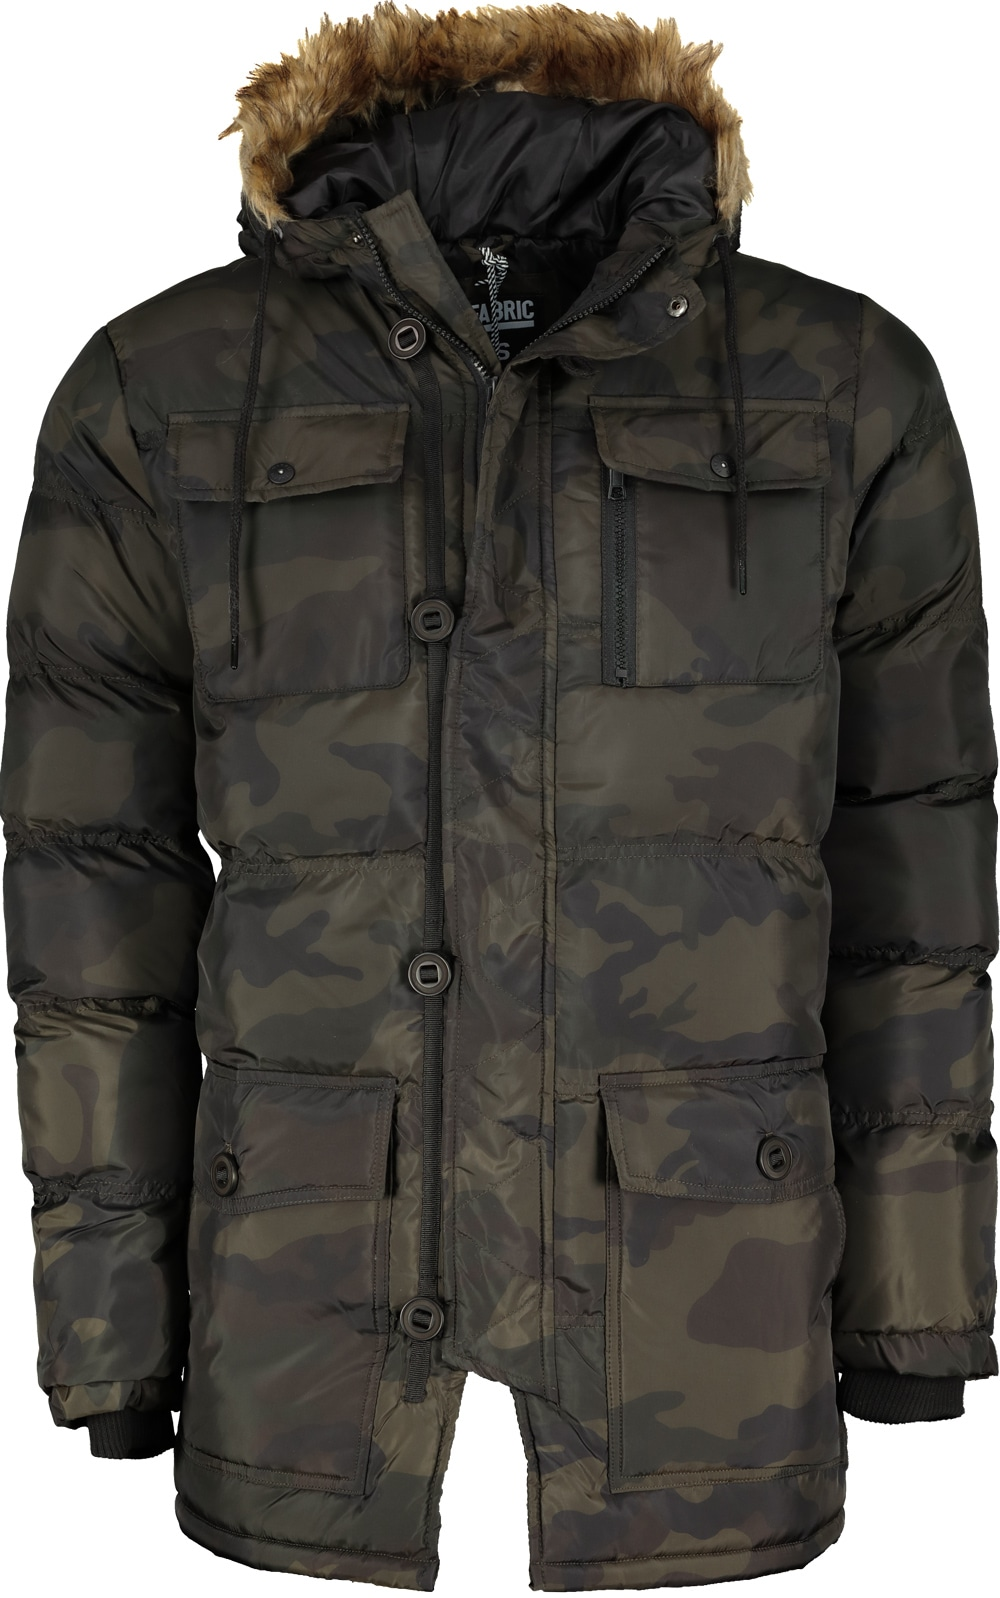 Fabric Camo Puffer Sn96 pánska bunda